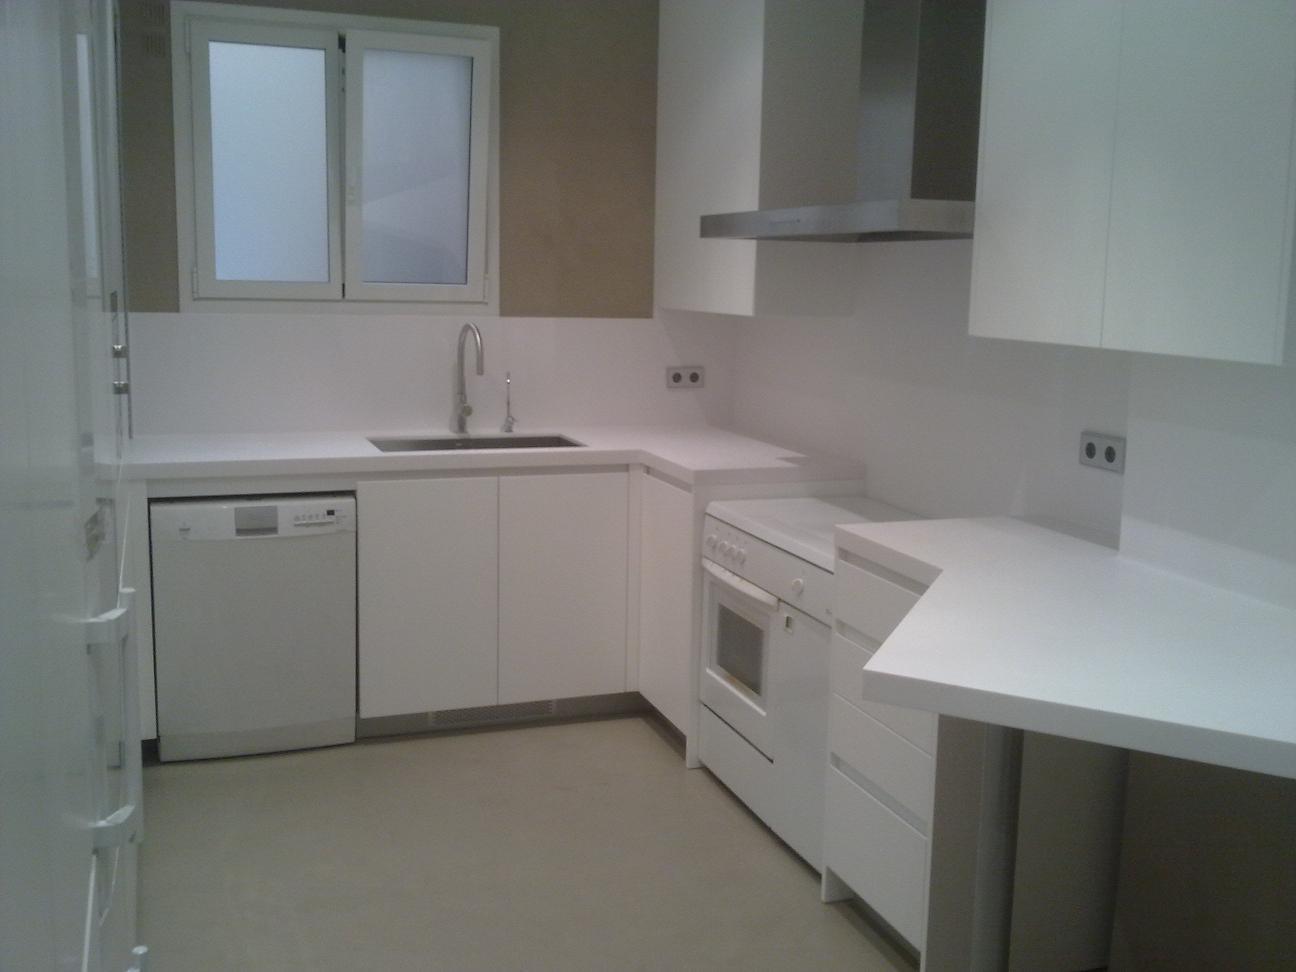 Madrid-cocina-211vb